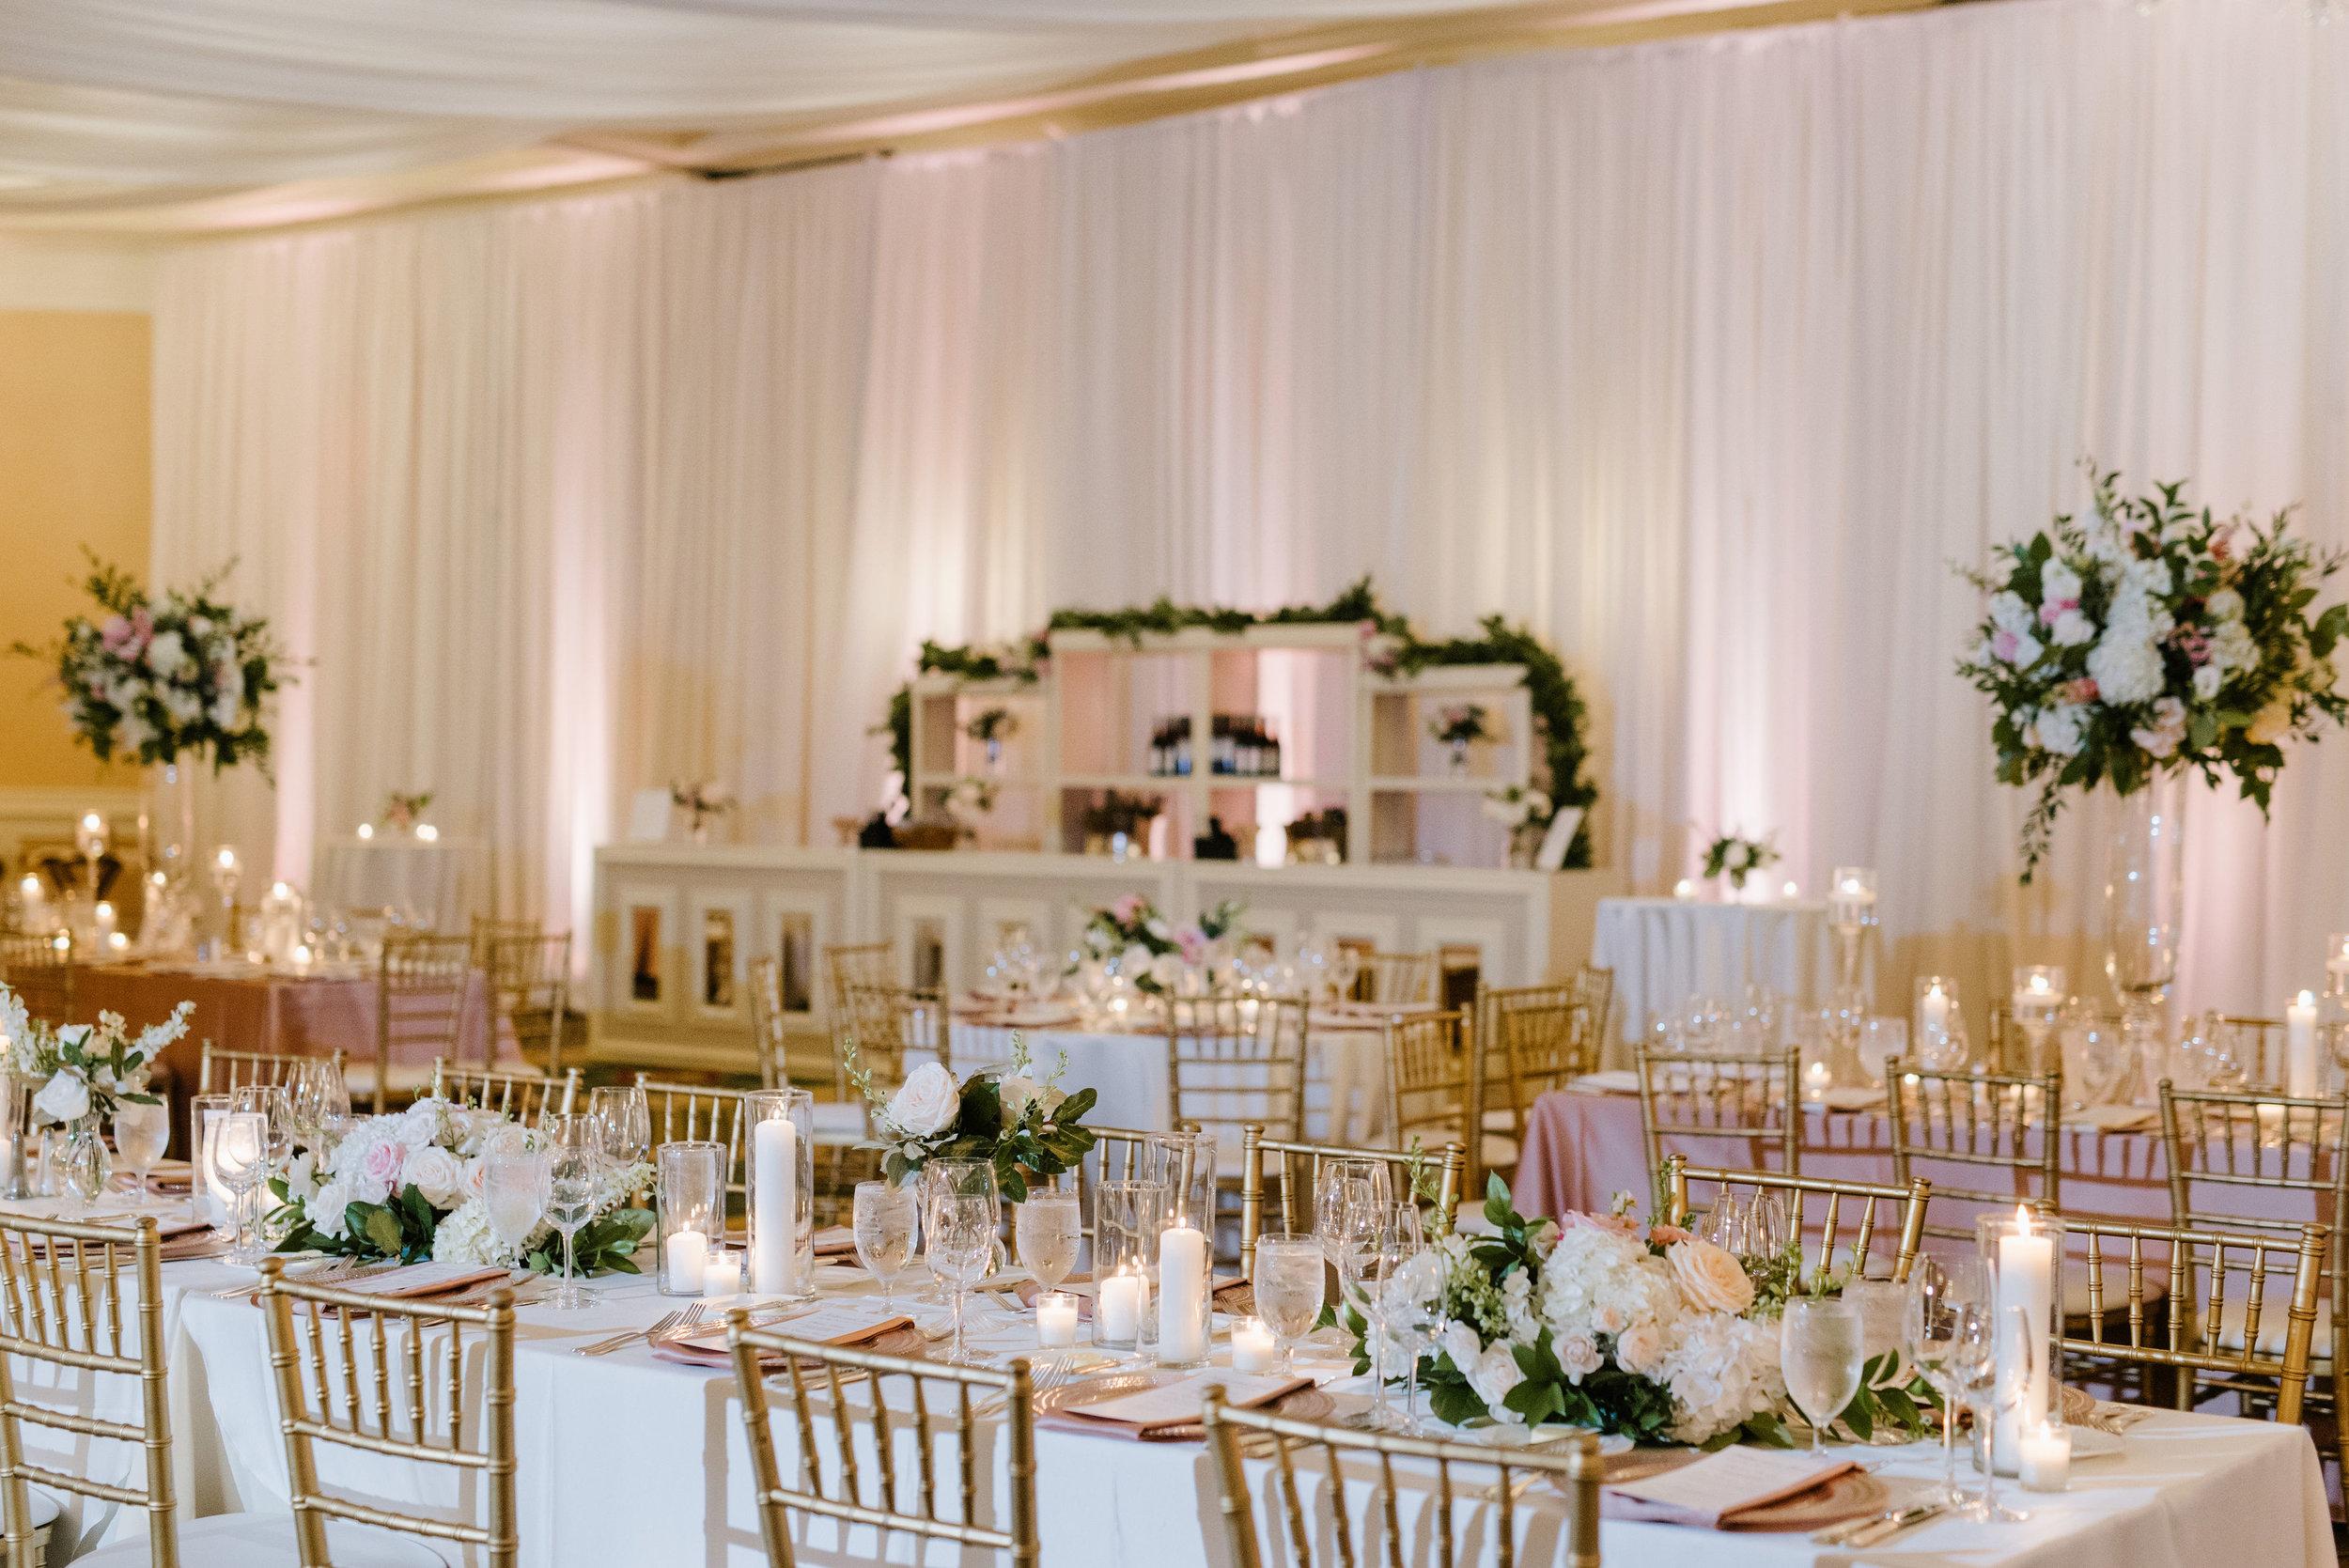 McElravey_Wedding_CarolineLimaPhotography_2018_311.jpg